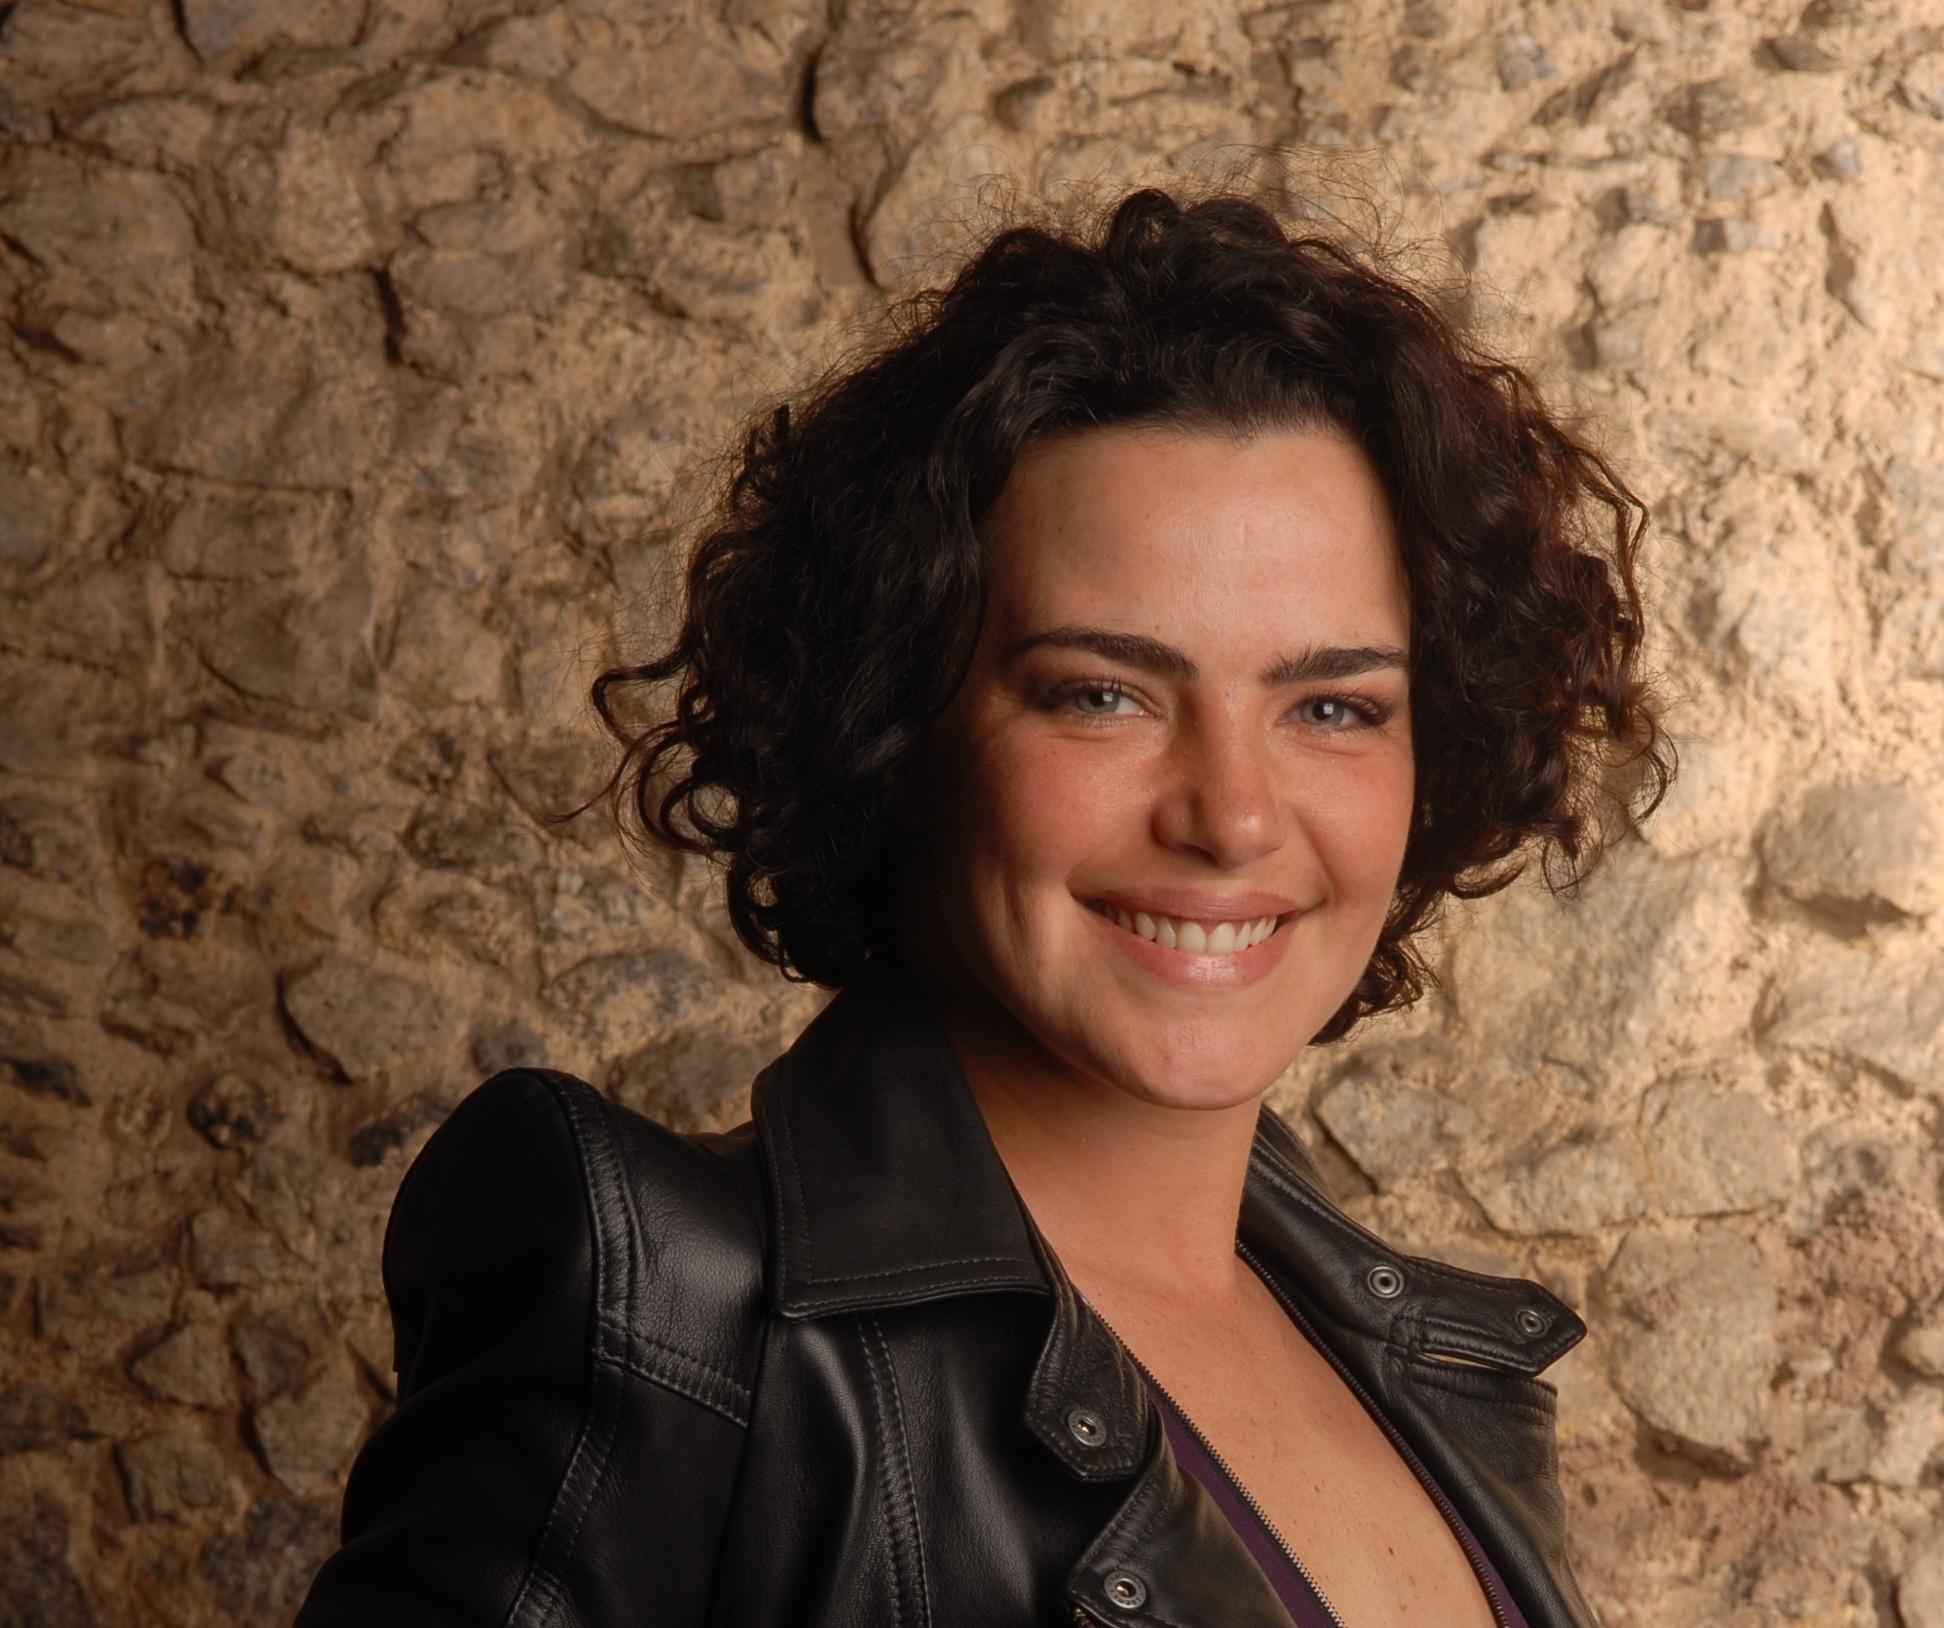 Ana Paula Arósio / Renato Rocha Miranda-RG